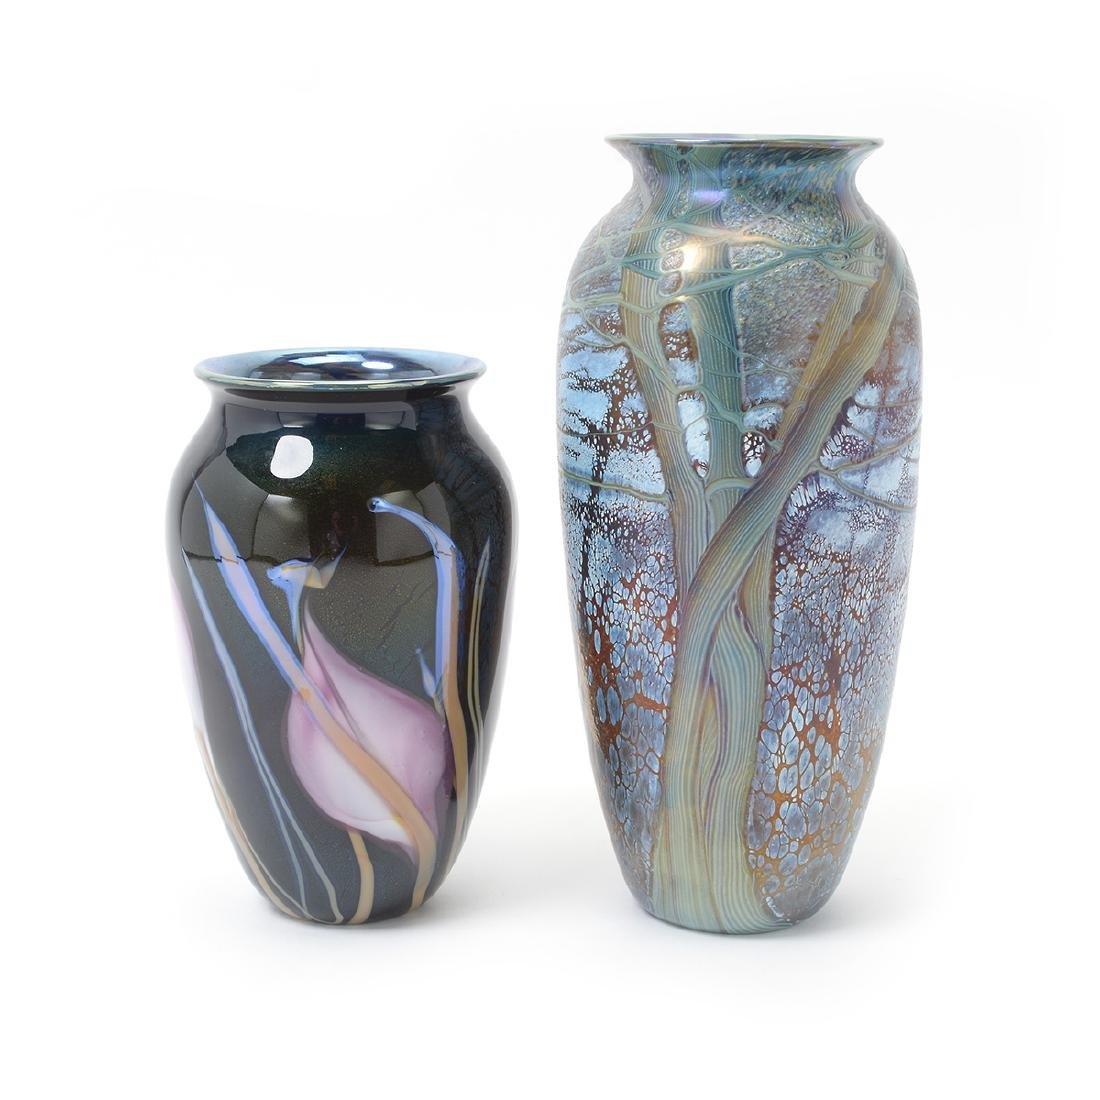 Two Richard Satava Art Glass Vases - Interior Lily and